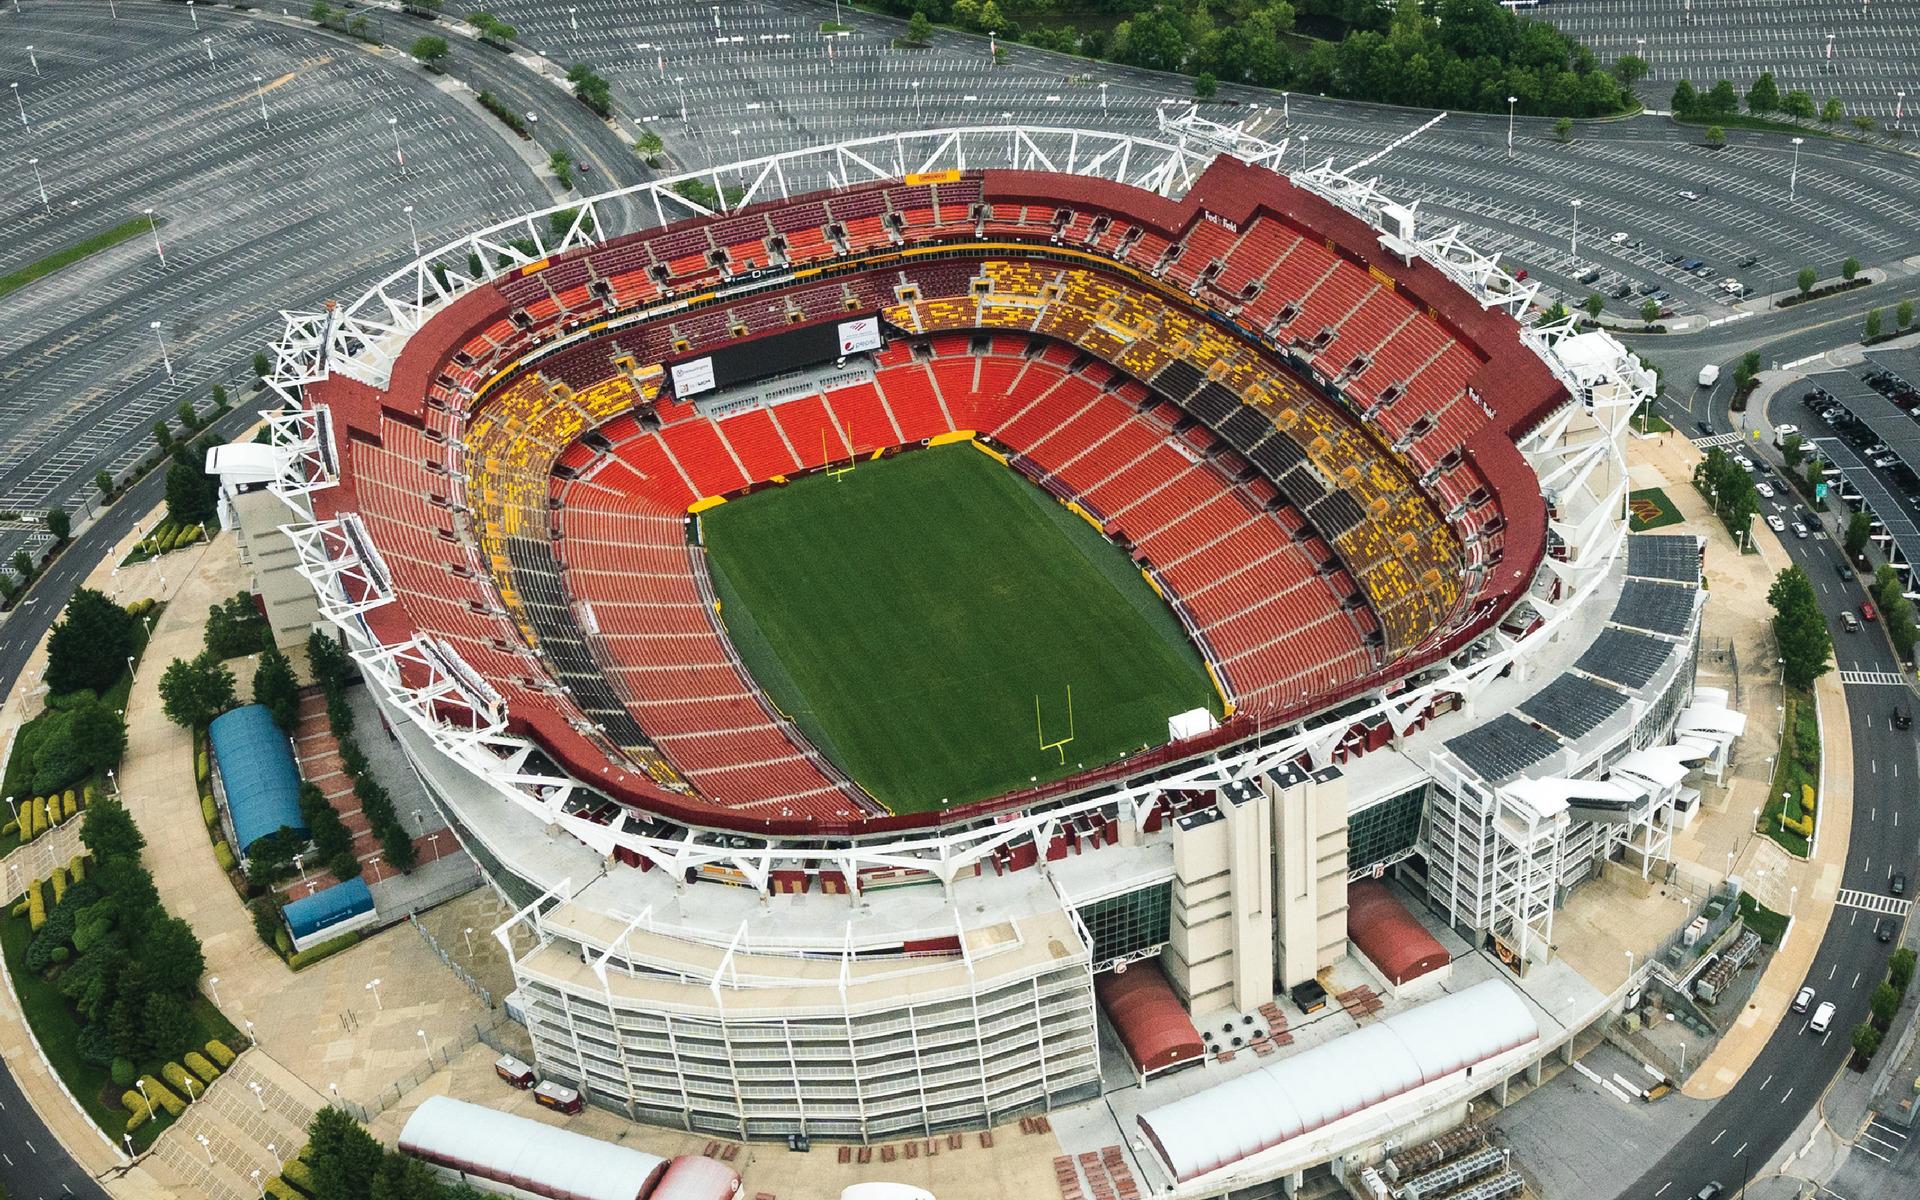 ae70193d Redskins vs Cowboys Tickets, Sep 15 in Landover | SeatGeek